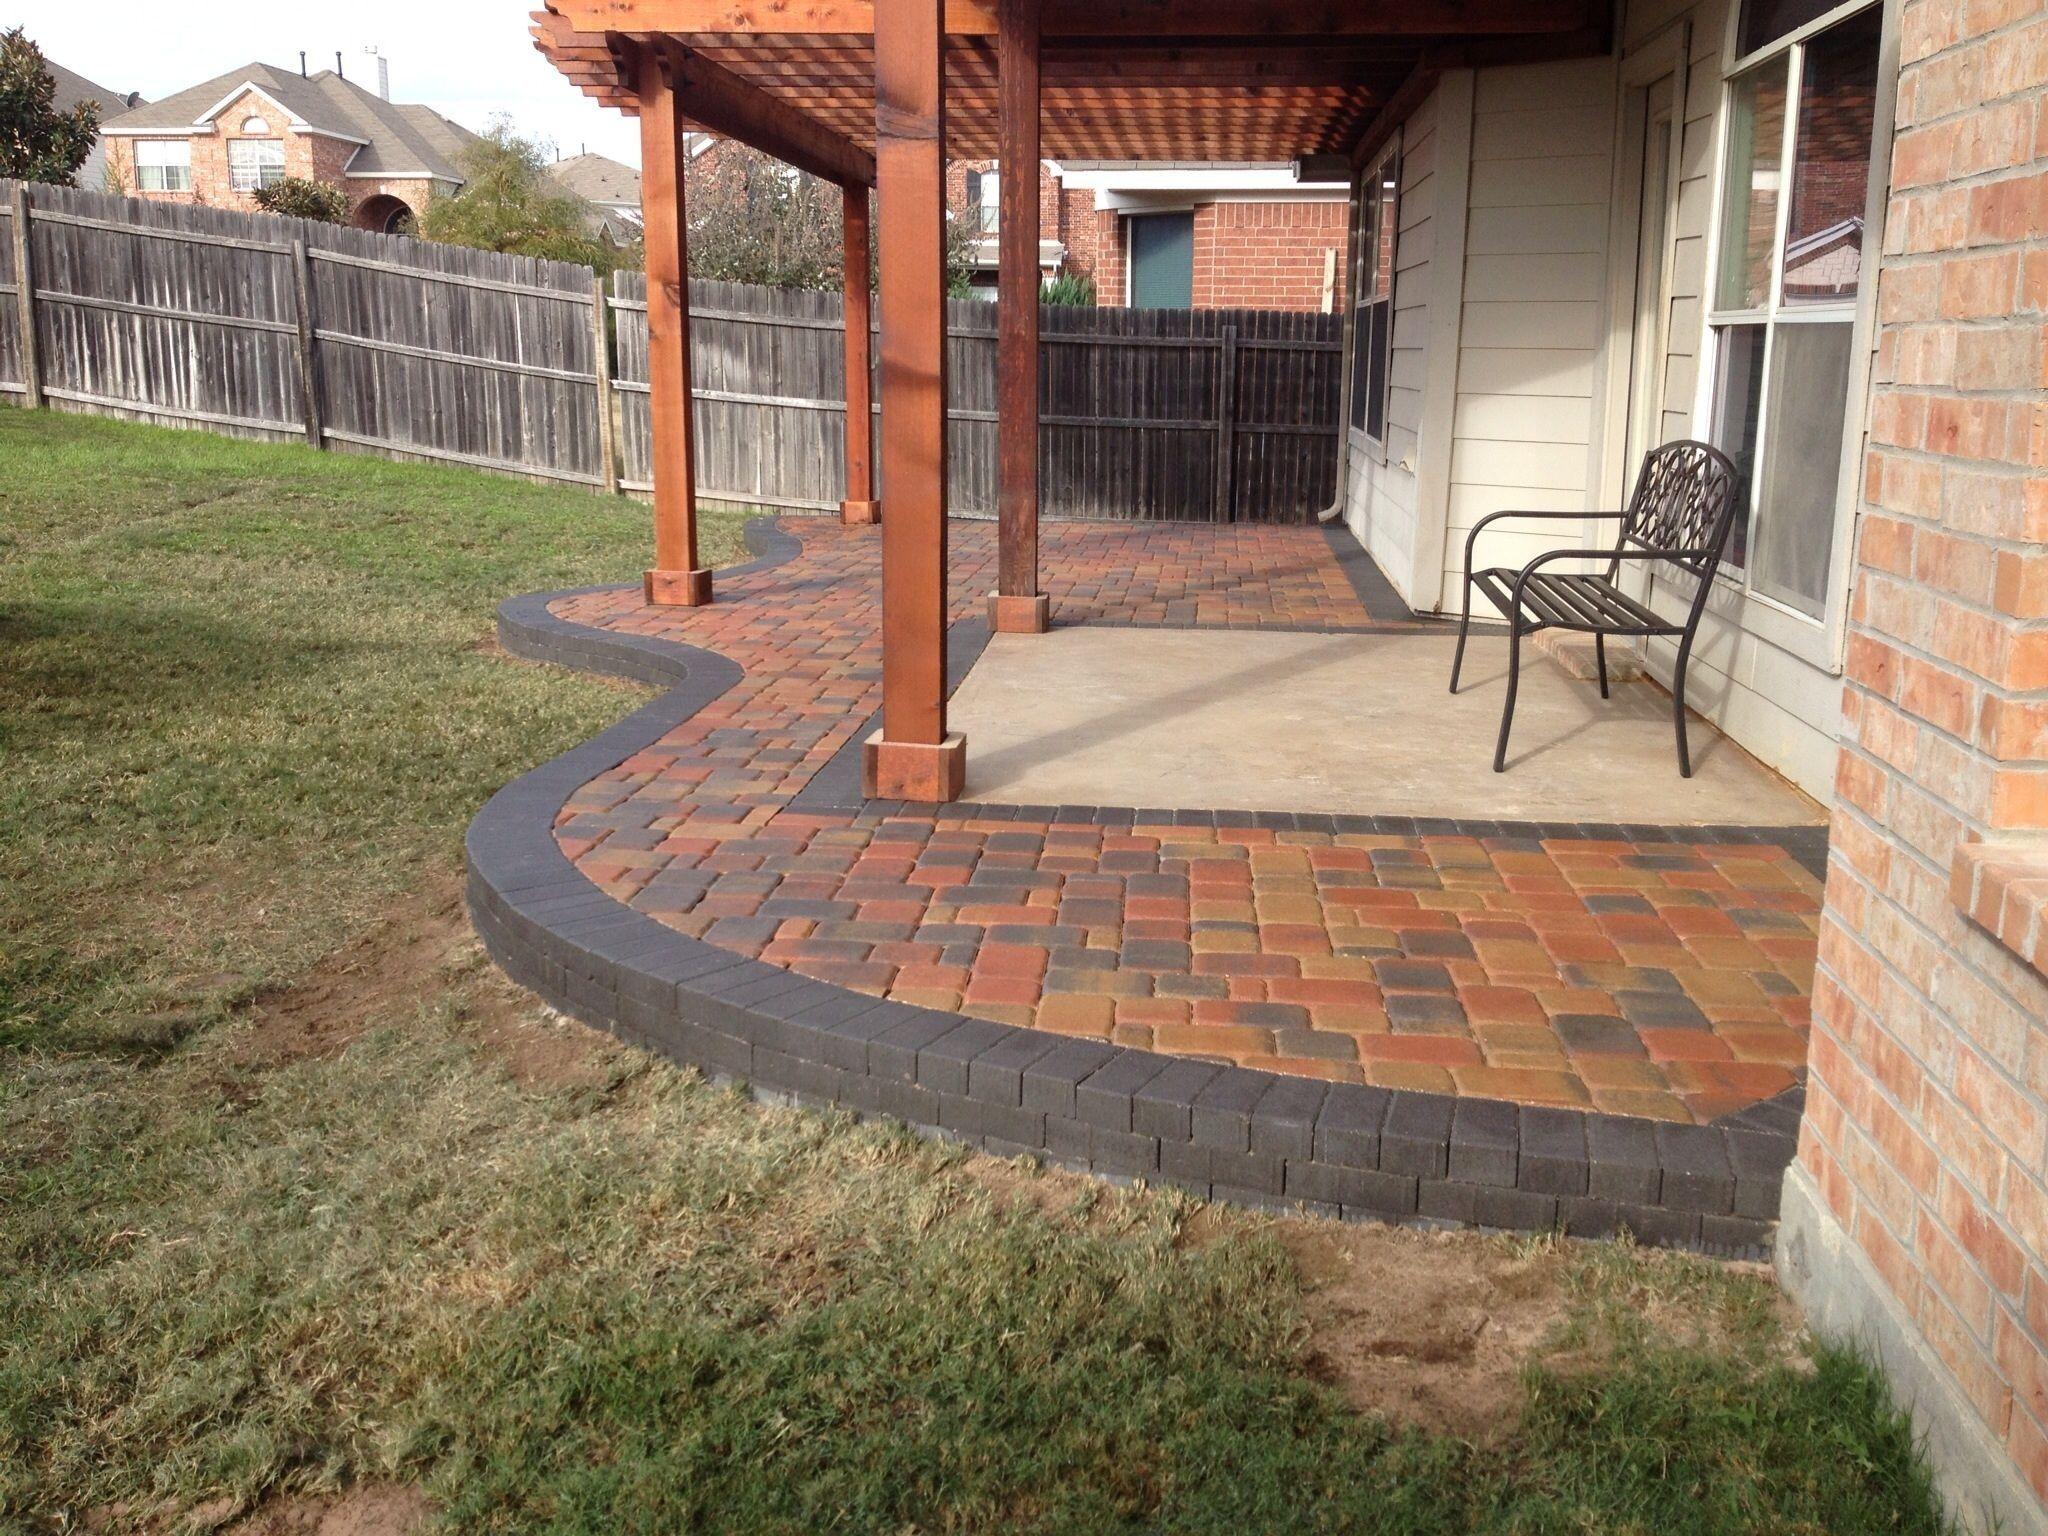 Elegant Concrete Patio Slab Ideas BW19fm4 Patio makeover